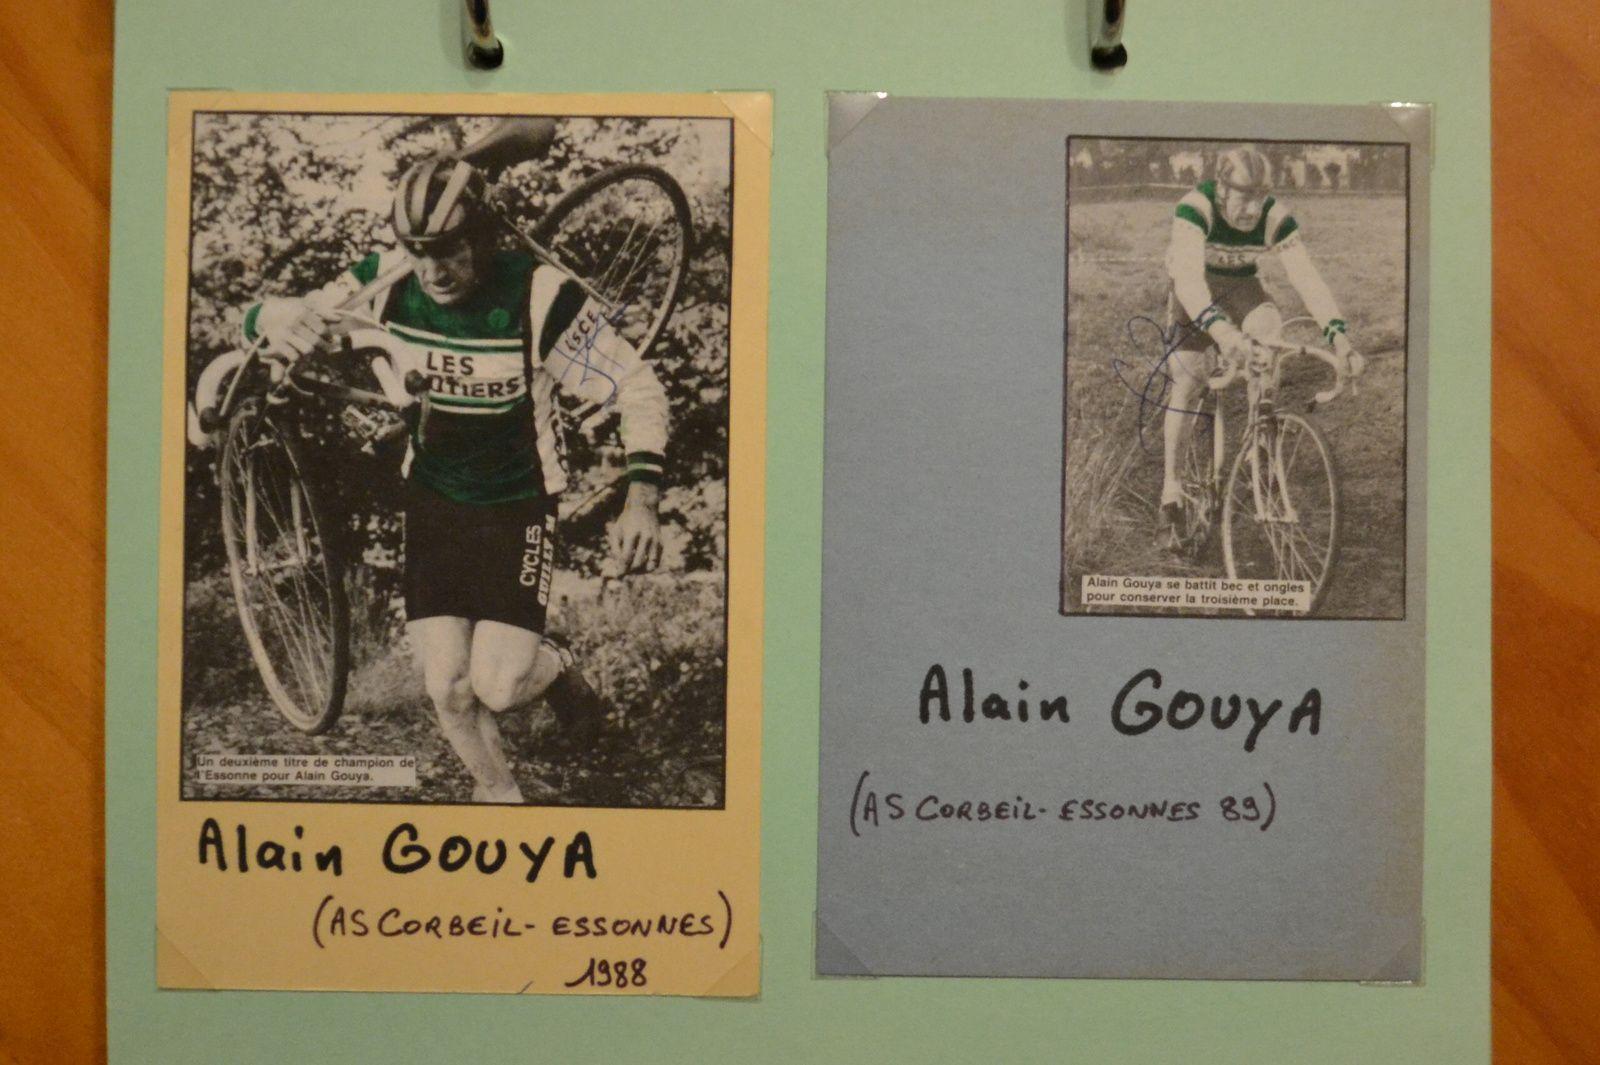 Alain GOUYA, un breton à son époque AS Corbeil-Essonnes (91)